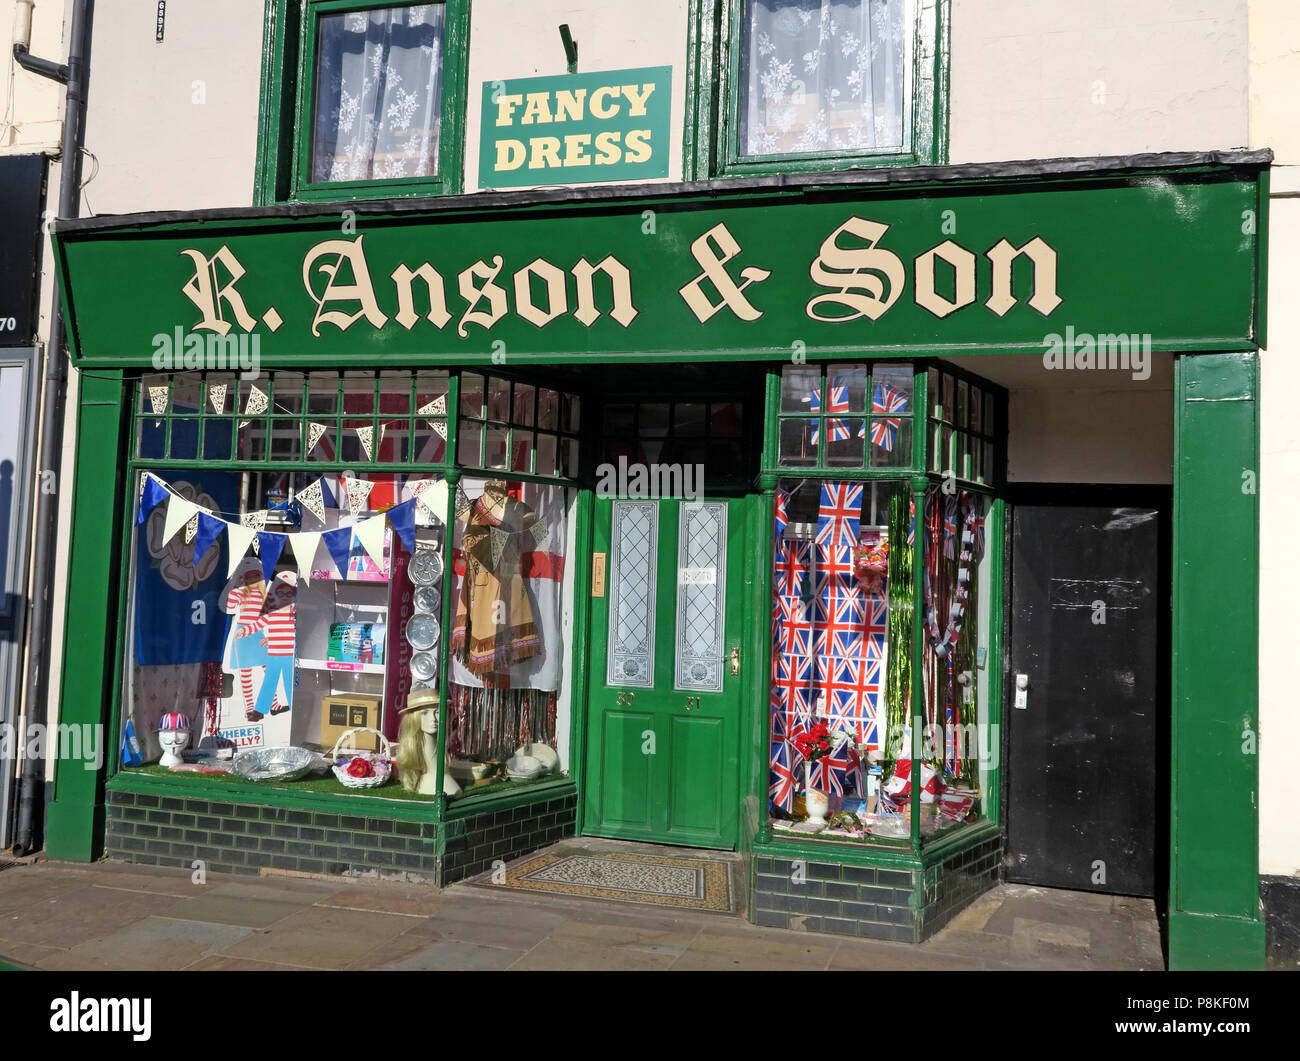 @HotpixUK,GoTonySmith,Anson,fancy Dress Shop,Yorkshire,UK,Shop,30-31,South Yorkshire,GB,shop,shopping,problem,decline,green,shop front,joke,joke shop,costume,costumes,shopfront,donny,independent,independent shop,30 Market Place,Market Place,Market Place Doncaster,Fancy dress shop in Doncaster,Fancy dress,in,Doncaster,DN1,R Anson,Costume Hire in Doncaster,Costume Hire Doncaster,Costume Hire